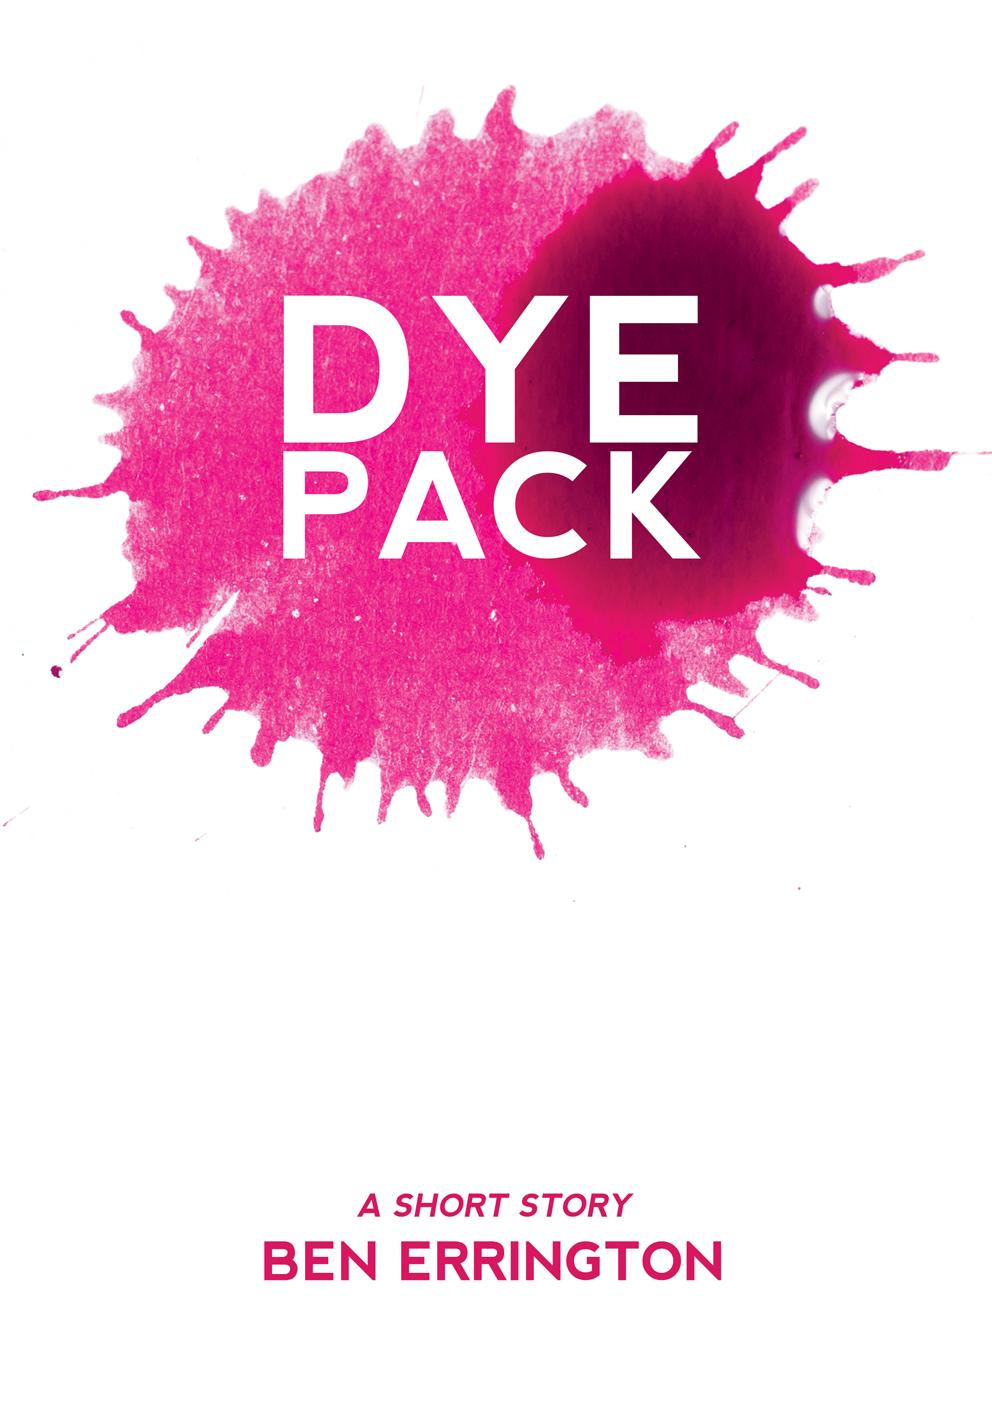 Dye Pack